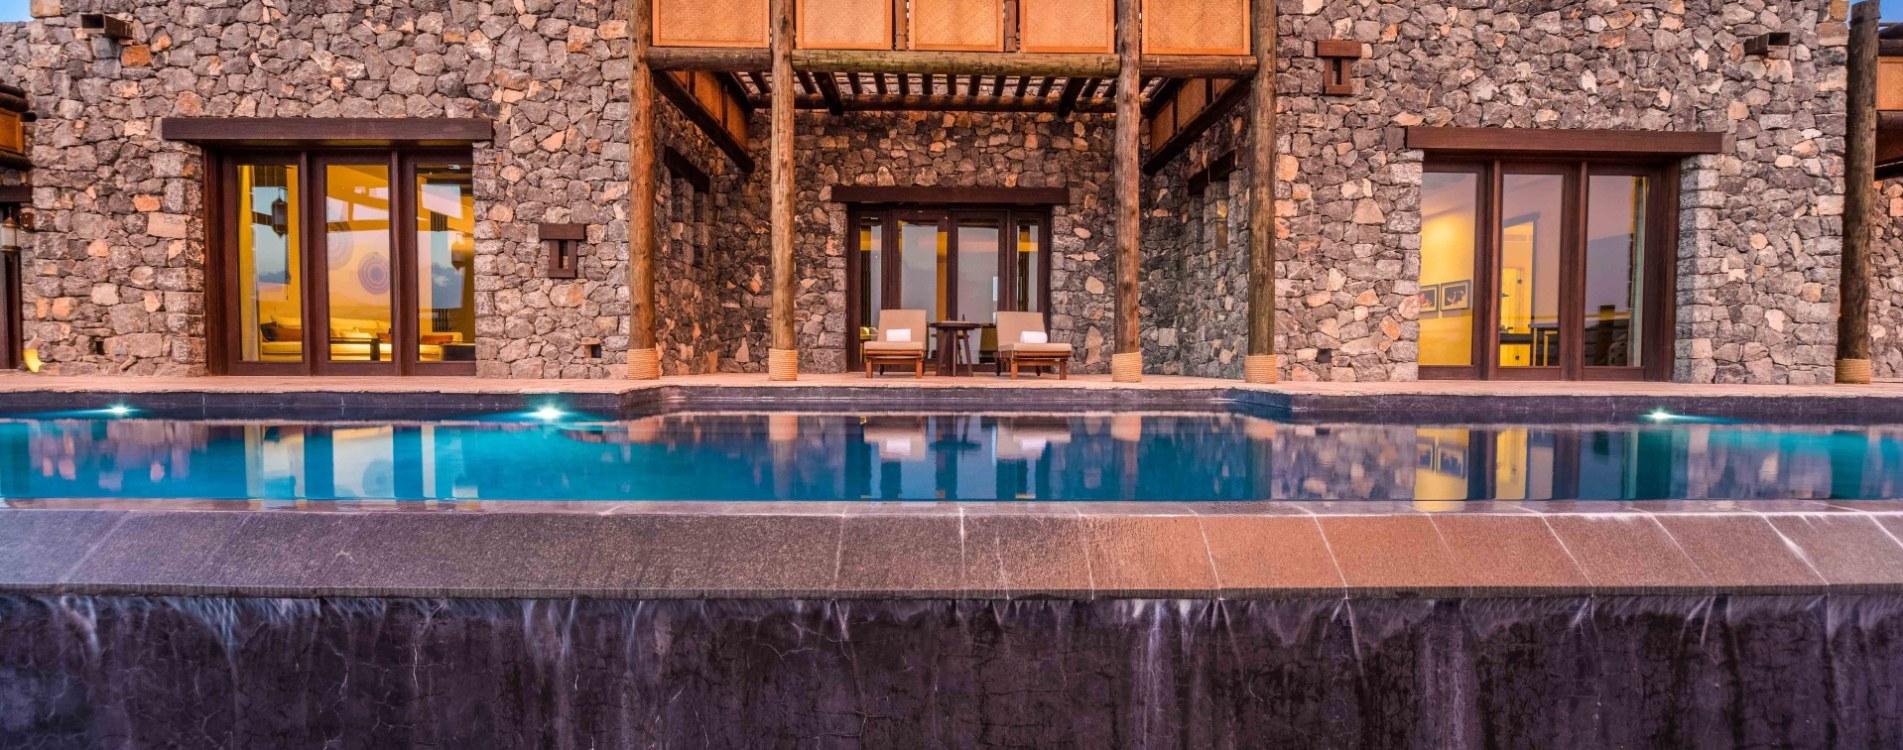 Alila-Jabal-Akhdar-Jabal-Villa-Exterior-Pool-Oman.jpg